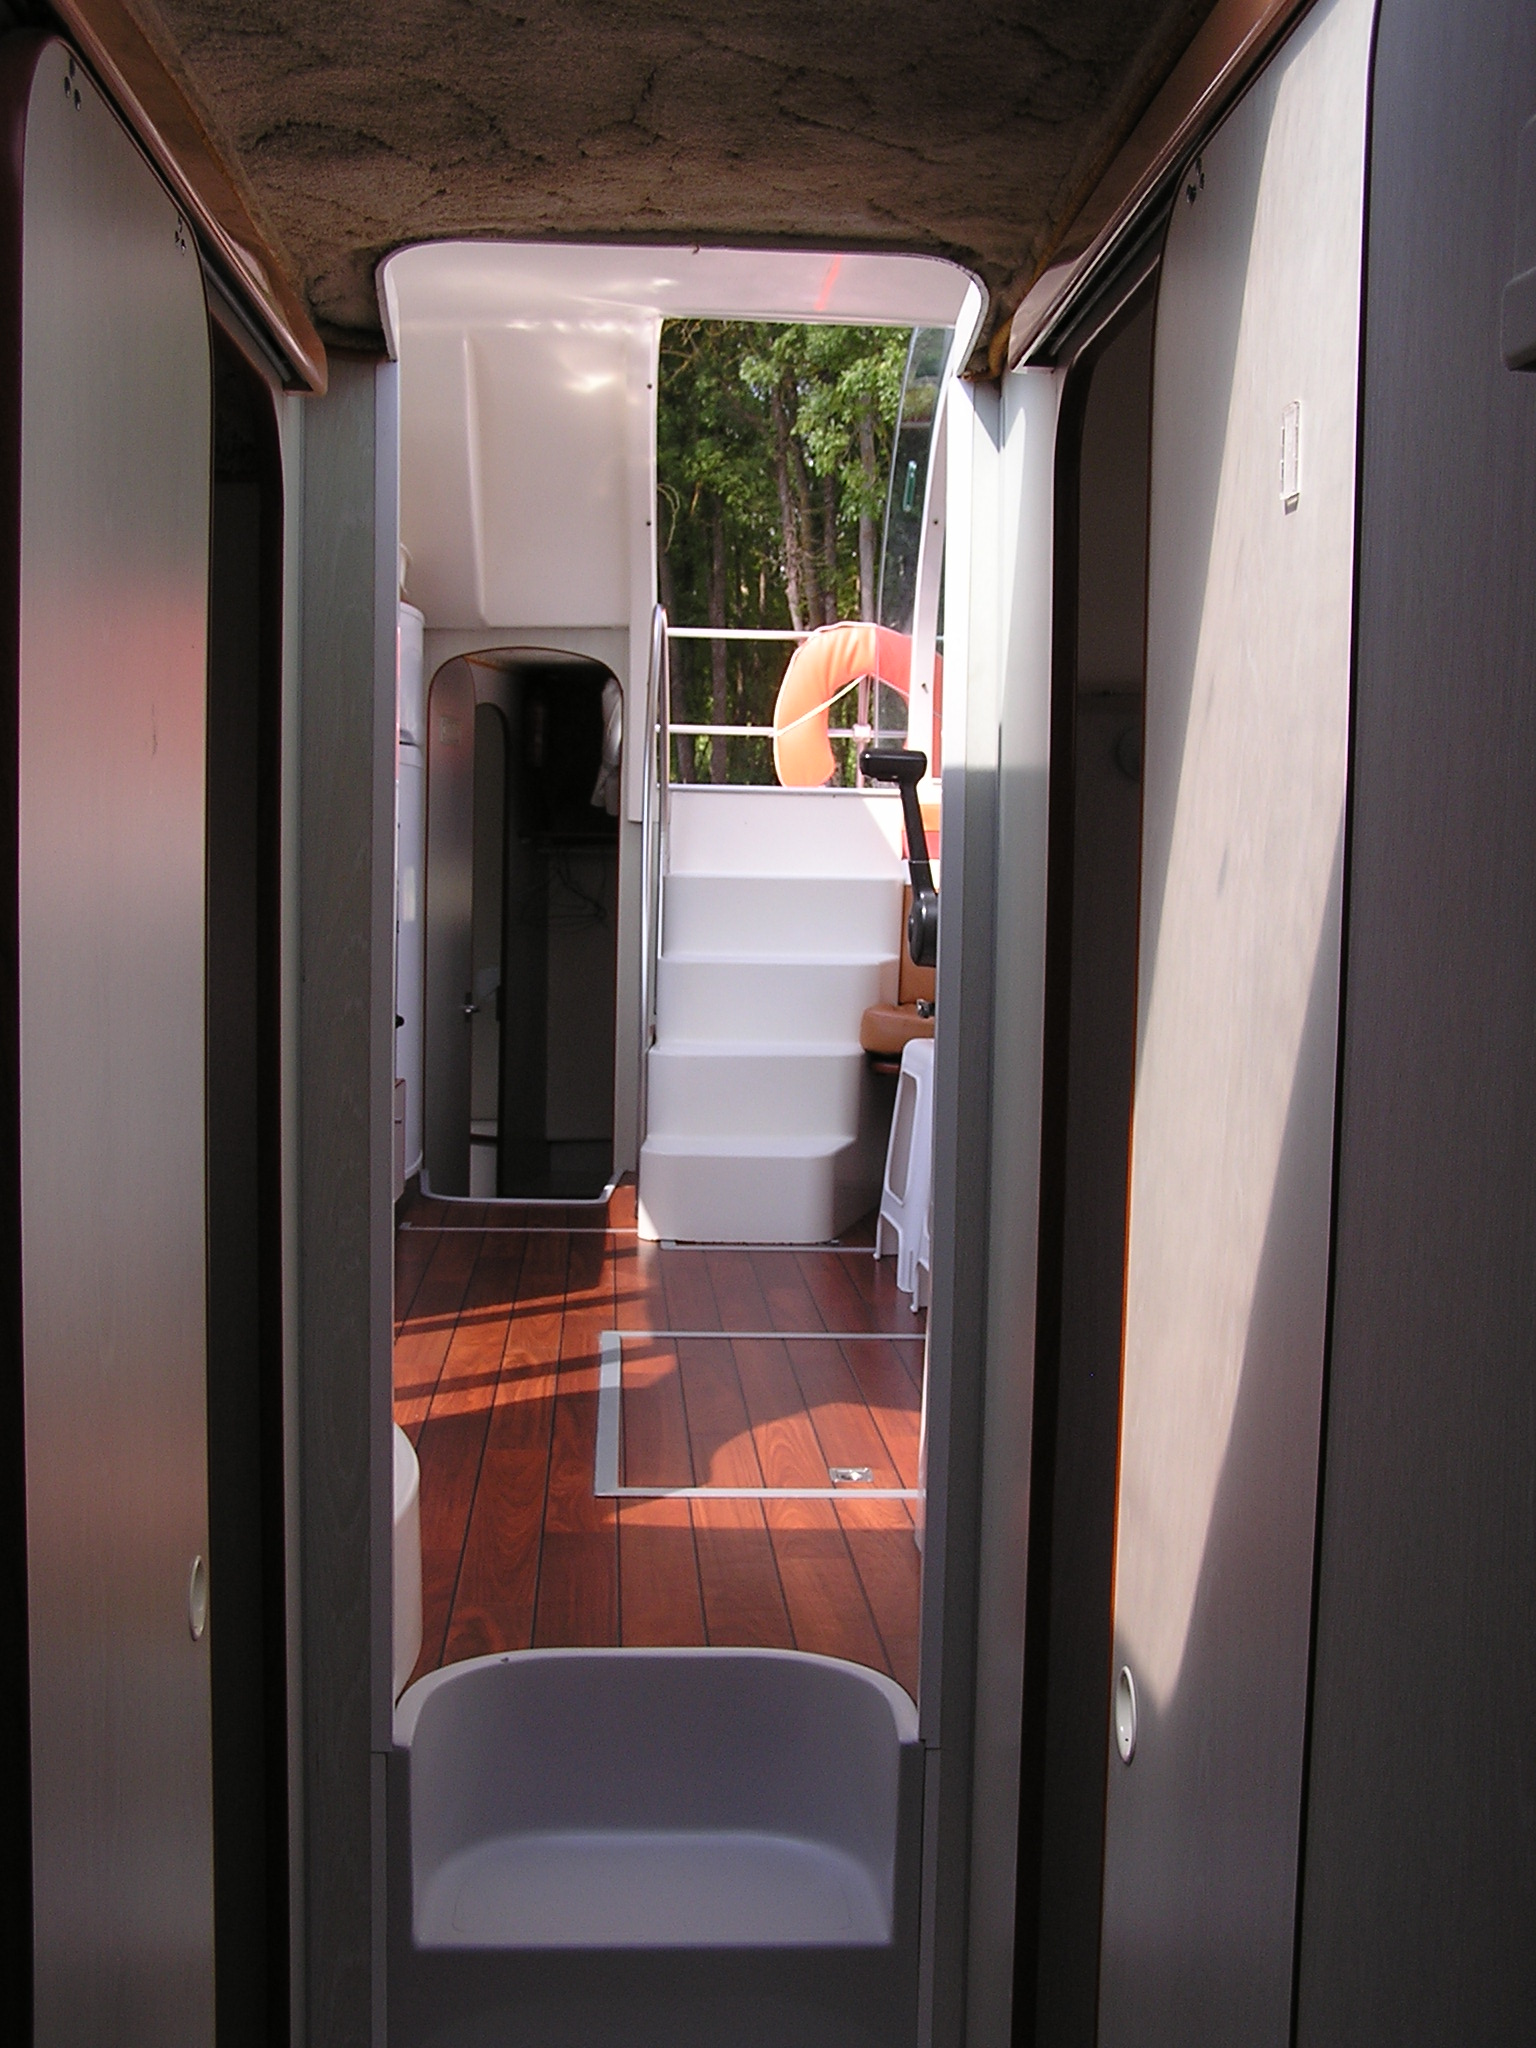 Nicols Confort 1100 couloir chambres avant sireuil charente intercroisieres